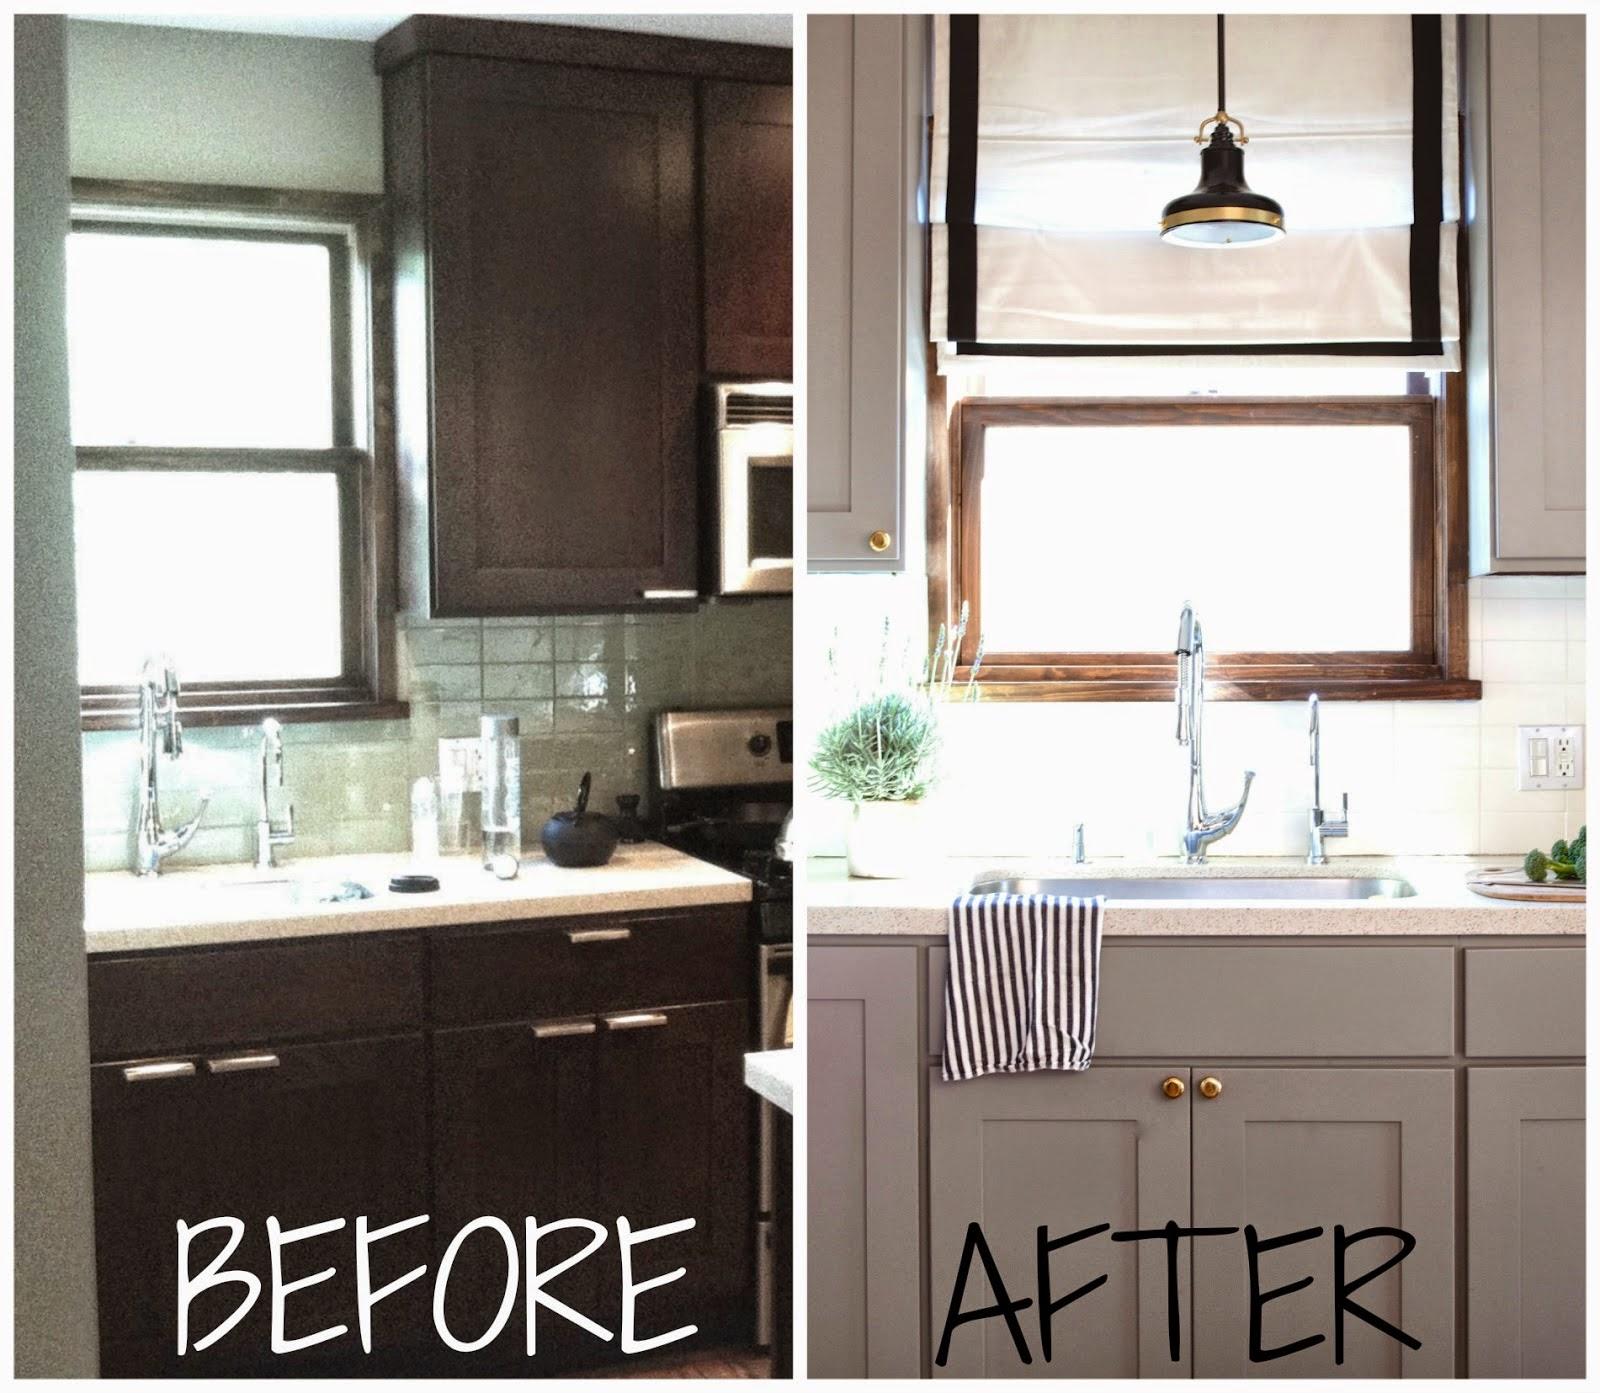 rosa beltran design diy painted tile backsplash painting kitchen backsplashes pictures ideas hgtv kitchen